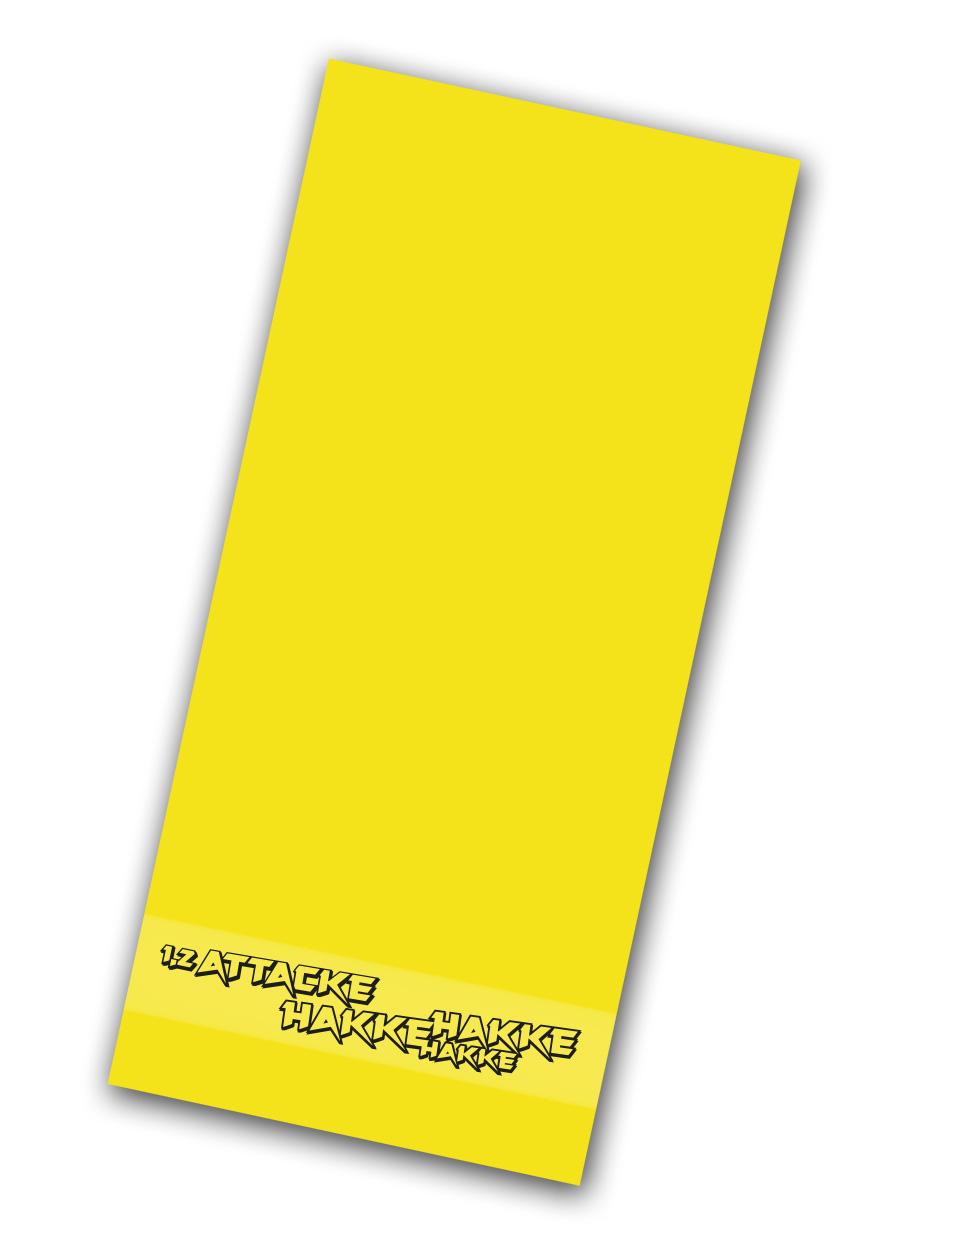 Hakke Hakke Hakke Handtuch - 3er Bundle schwarz auf gelb